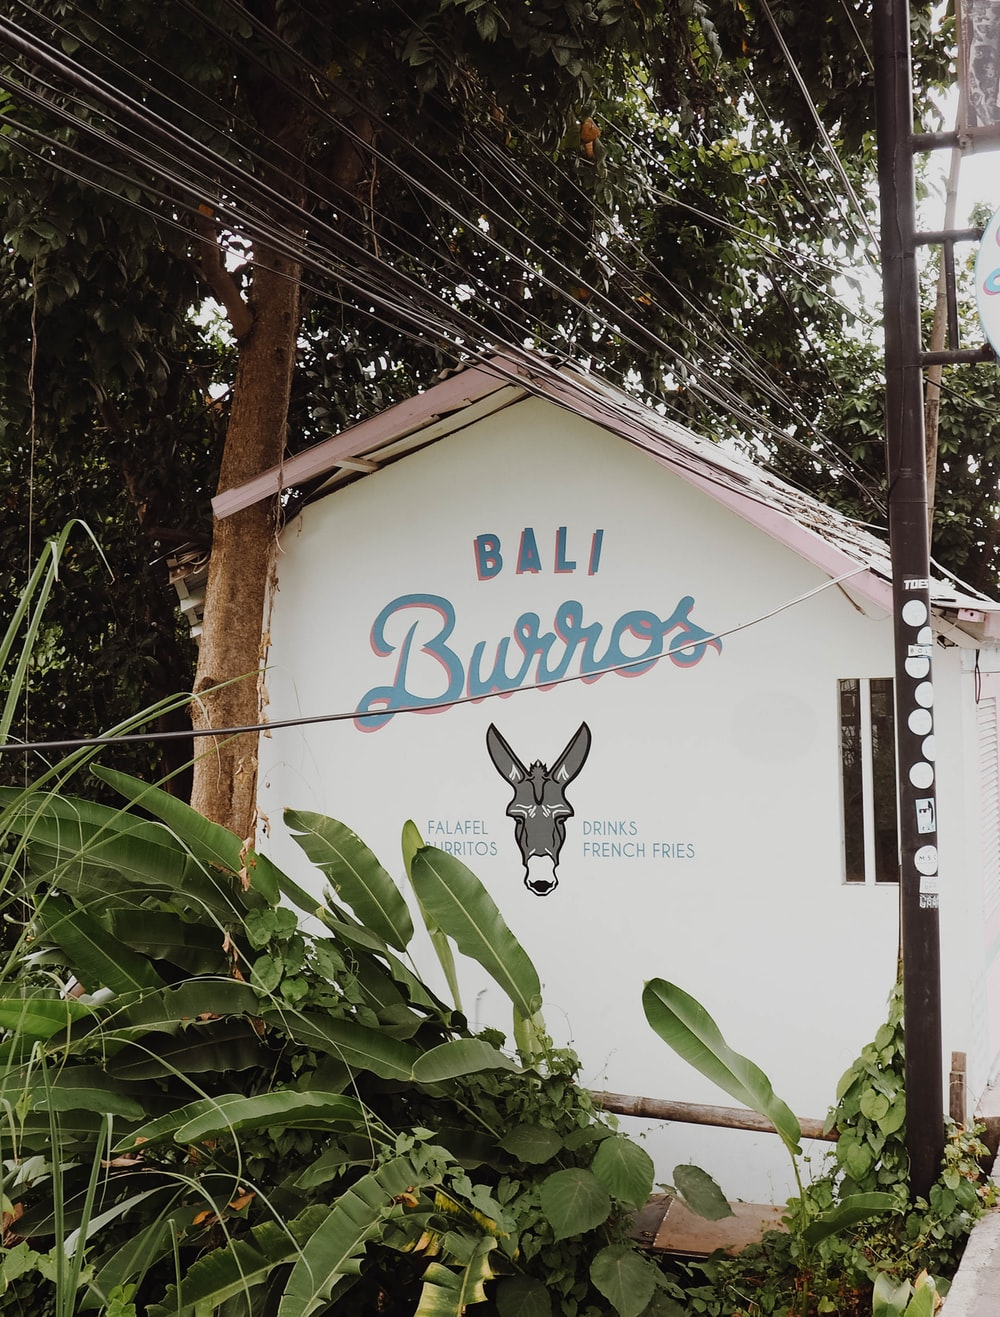 Bali Burros building